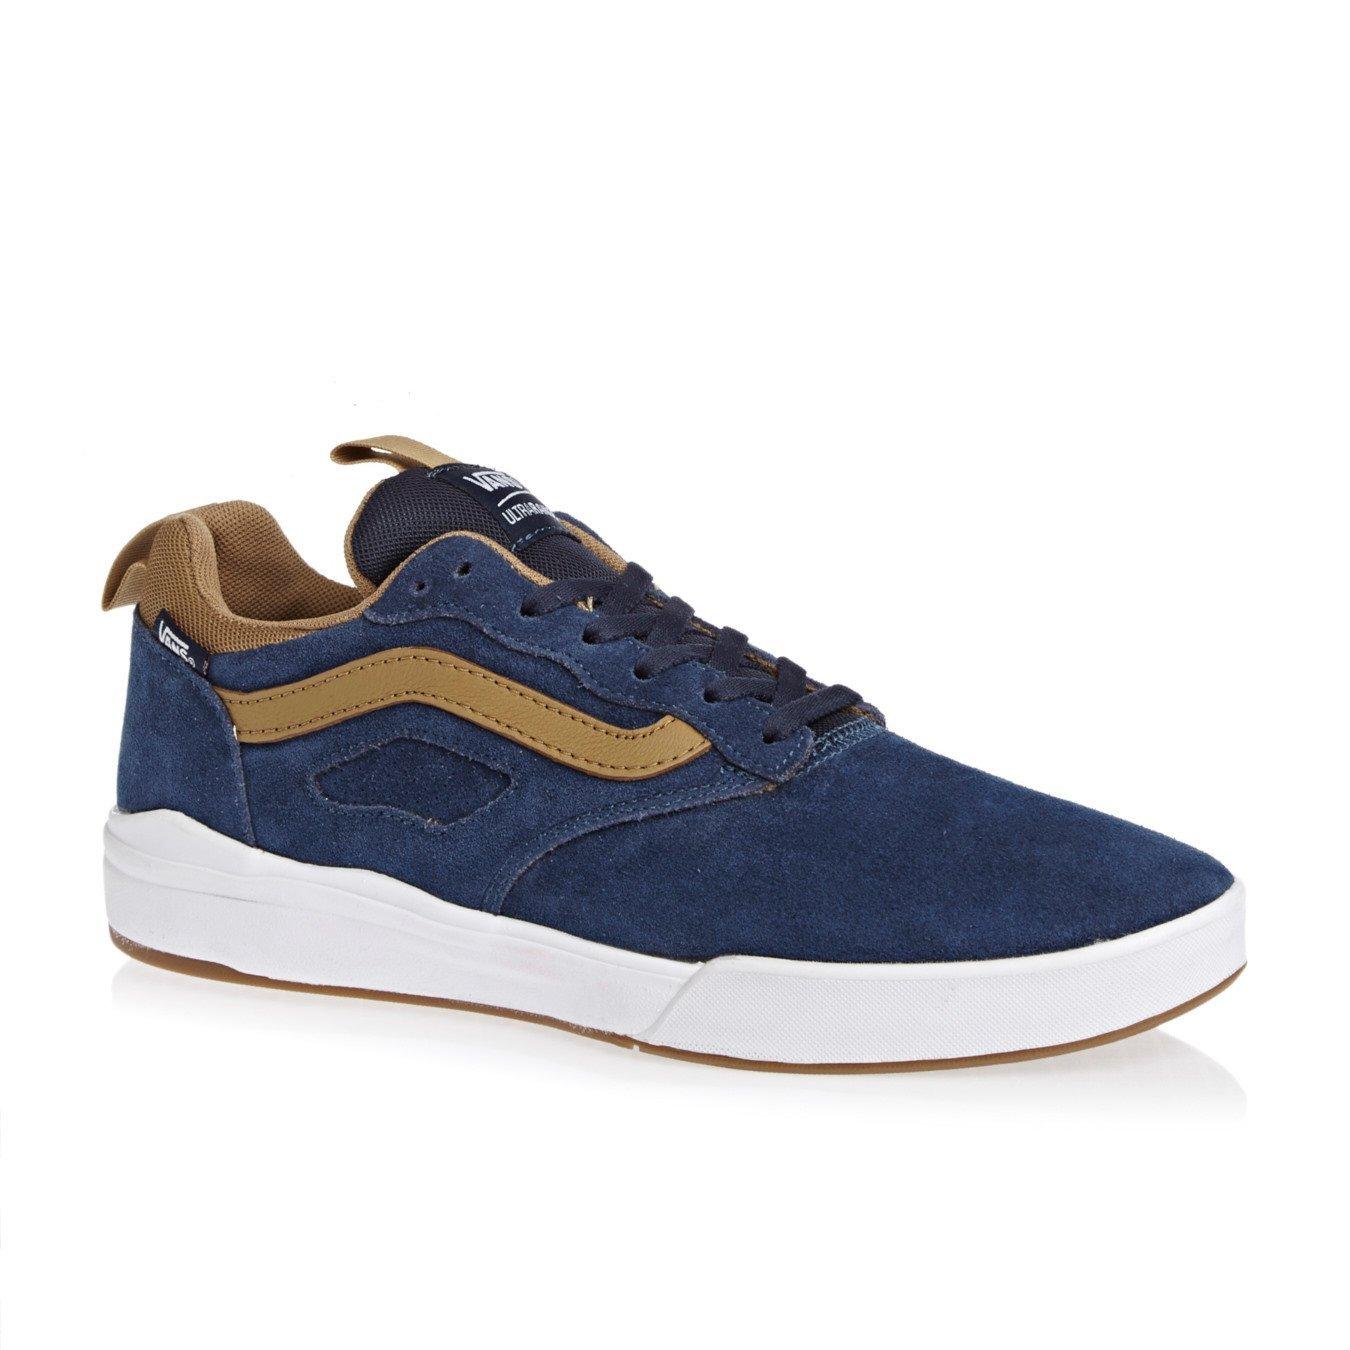 Vans Men's Ultrarange Pro Skate Shoe 7 D(M) US|Dress Blue-medal Bronze